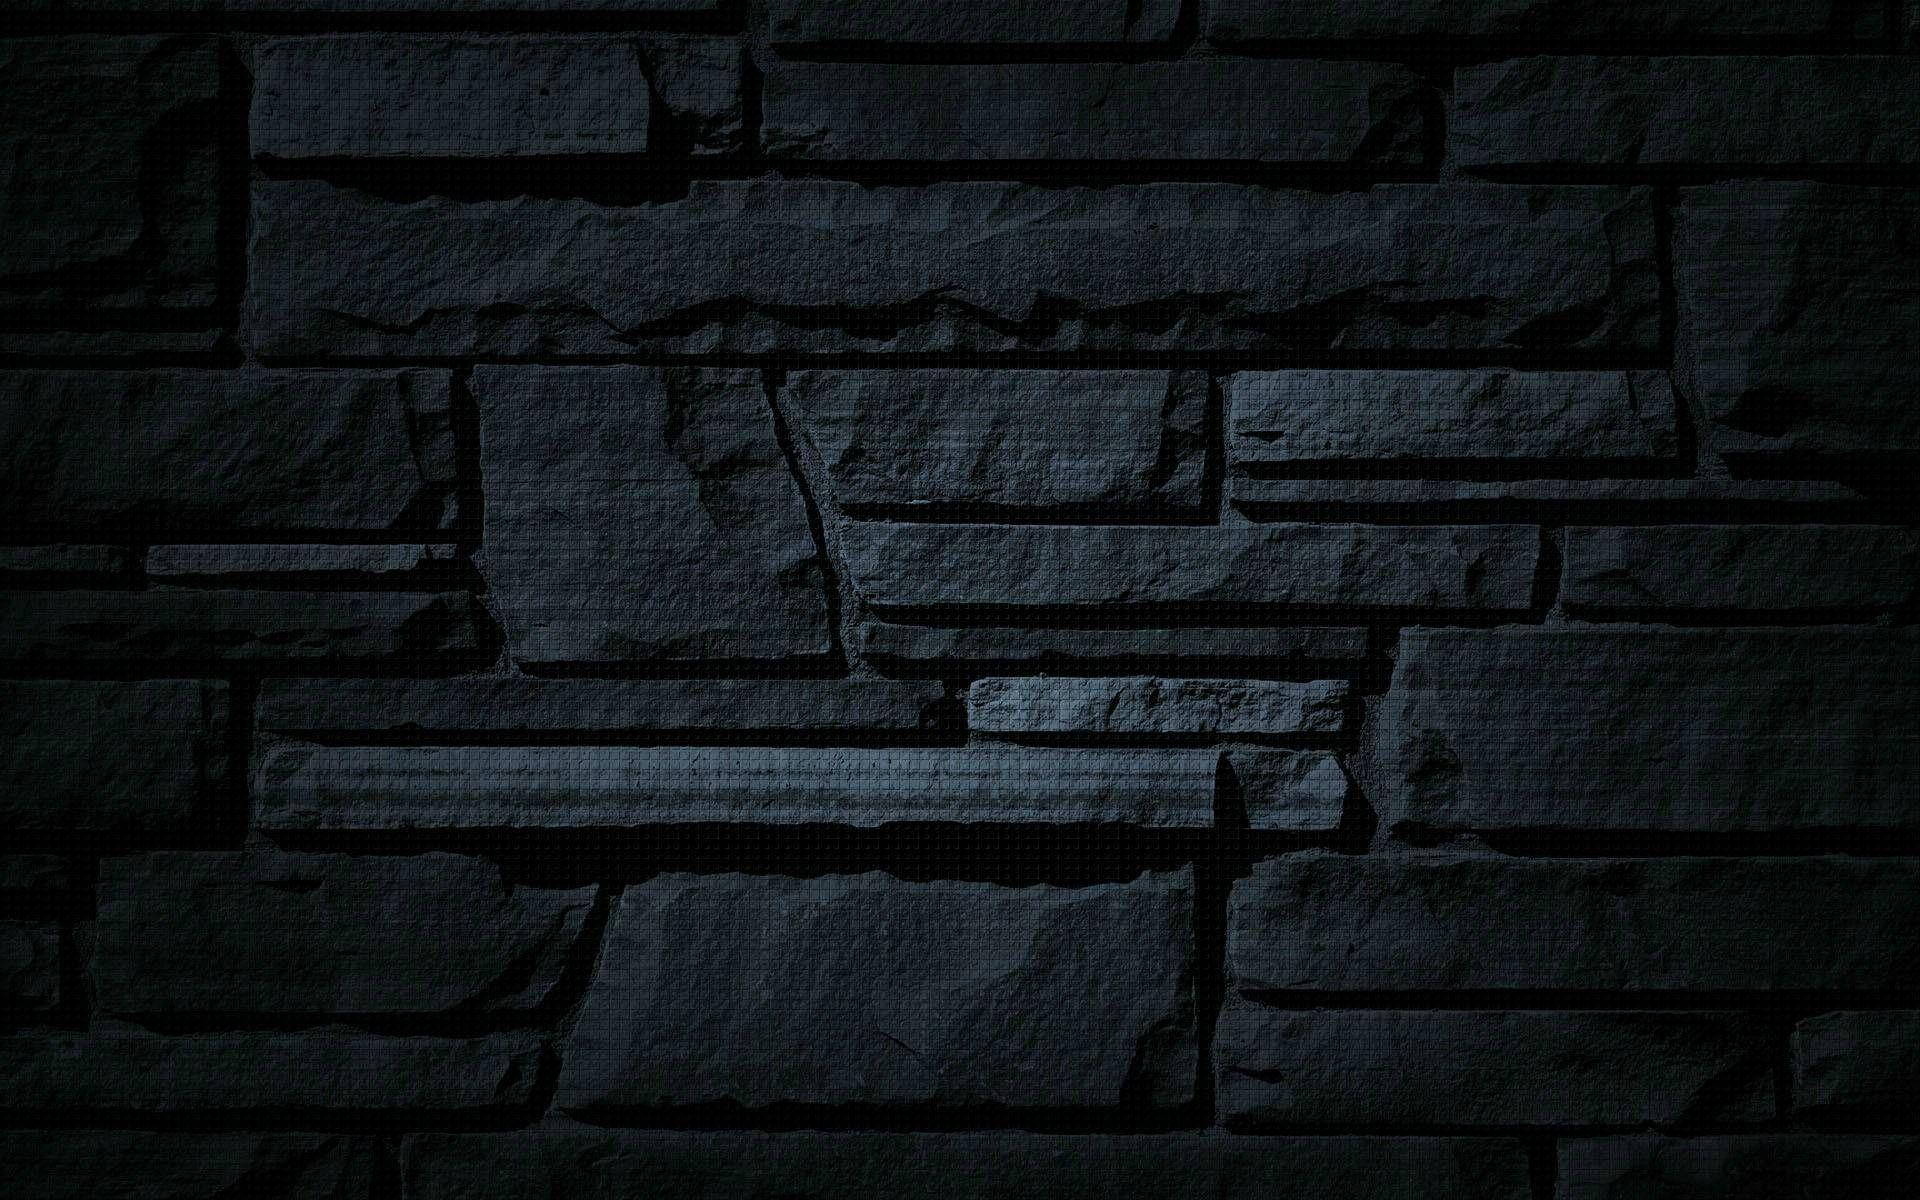 High Definition Mobile Phone And Desktop Wallpapers Black Brick Wallpaper Brick Wallpaper Textured Wallpaper